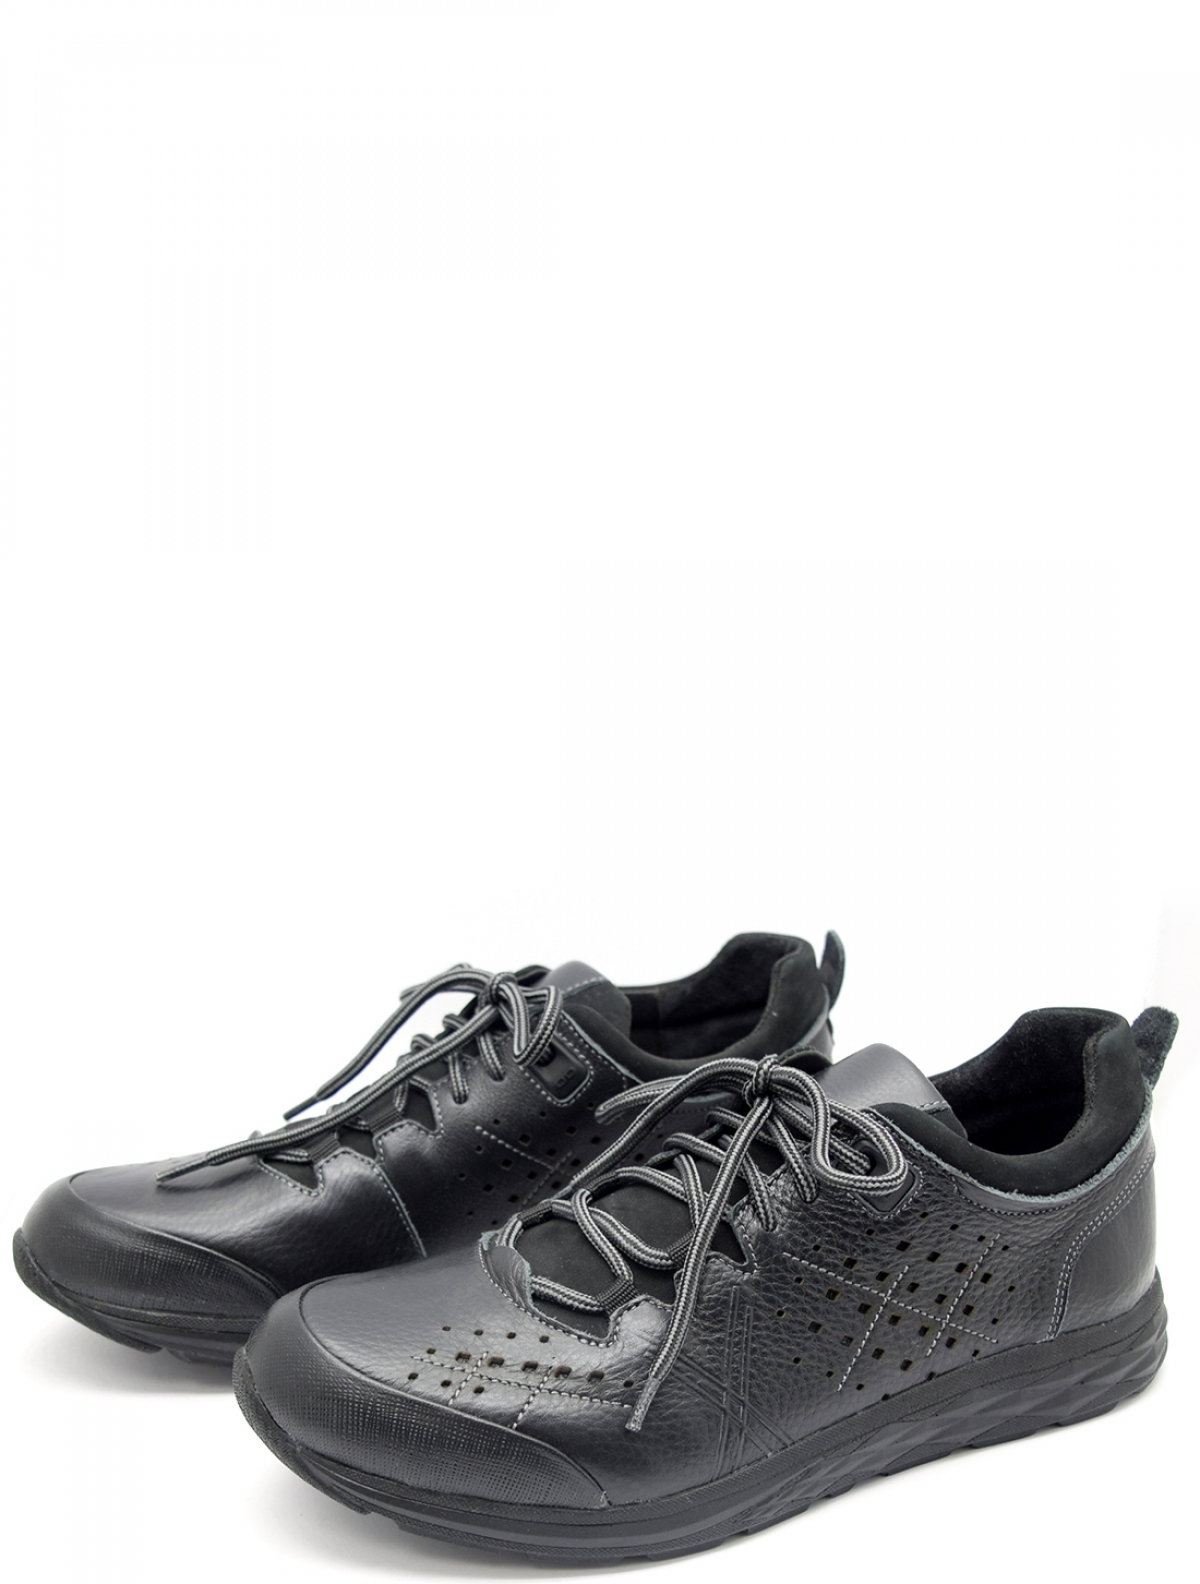 Bossner 1-464-100-5 мужские туфли